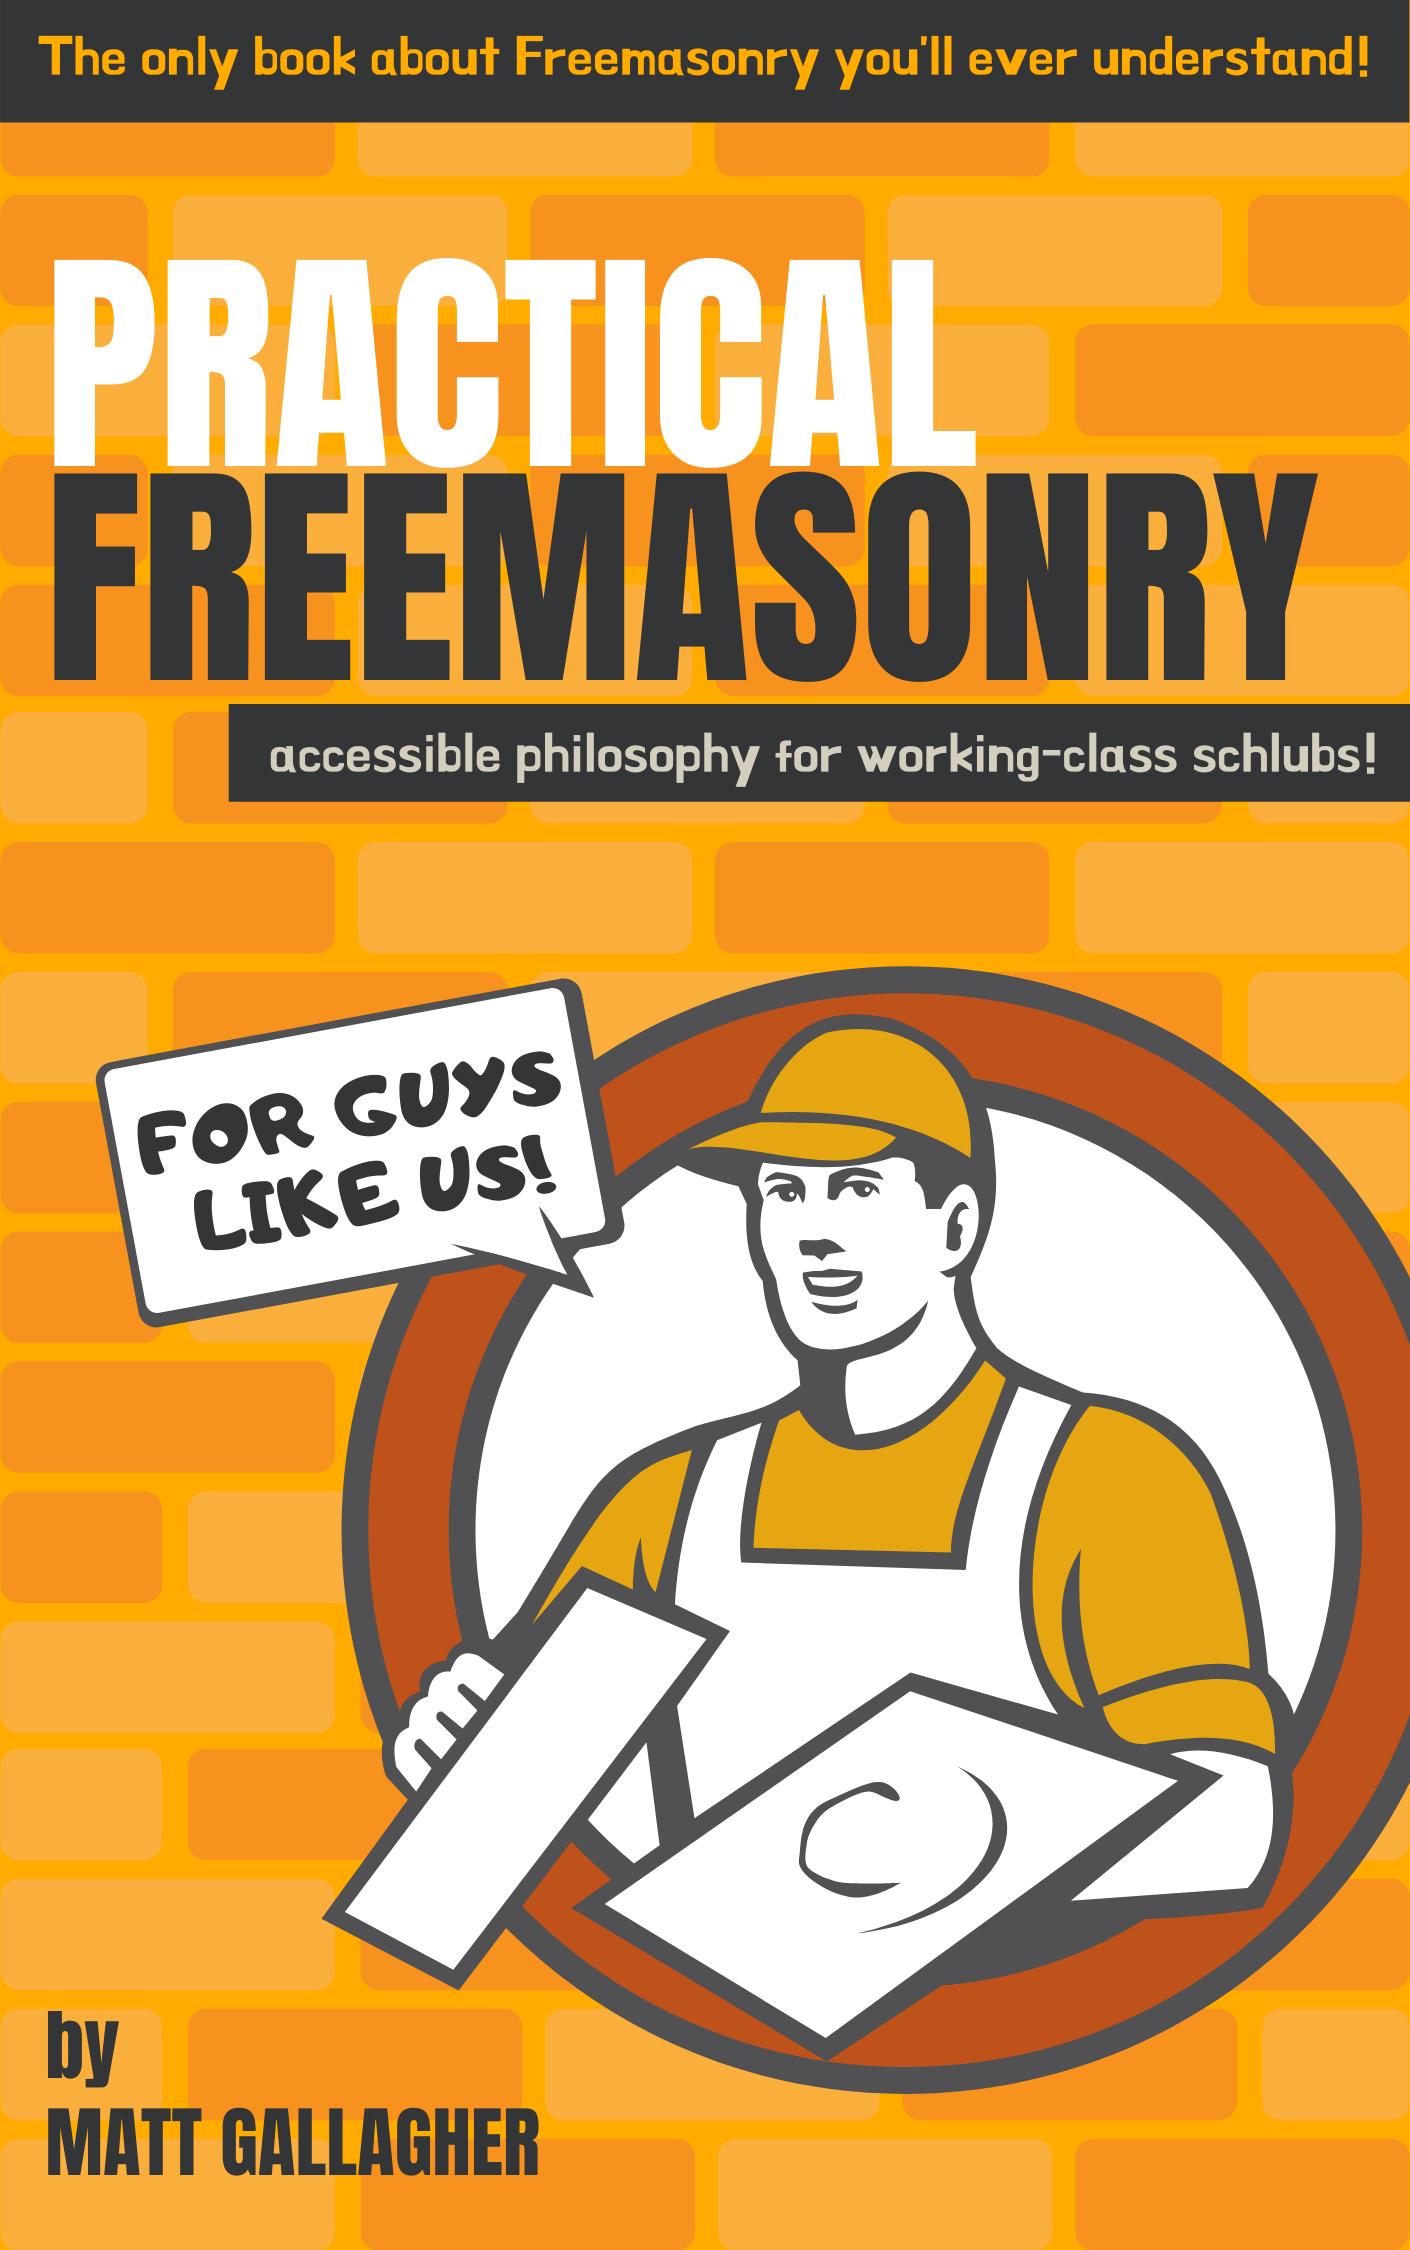 practical-freemasonry-cover-2